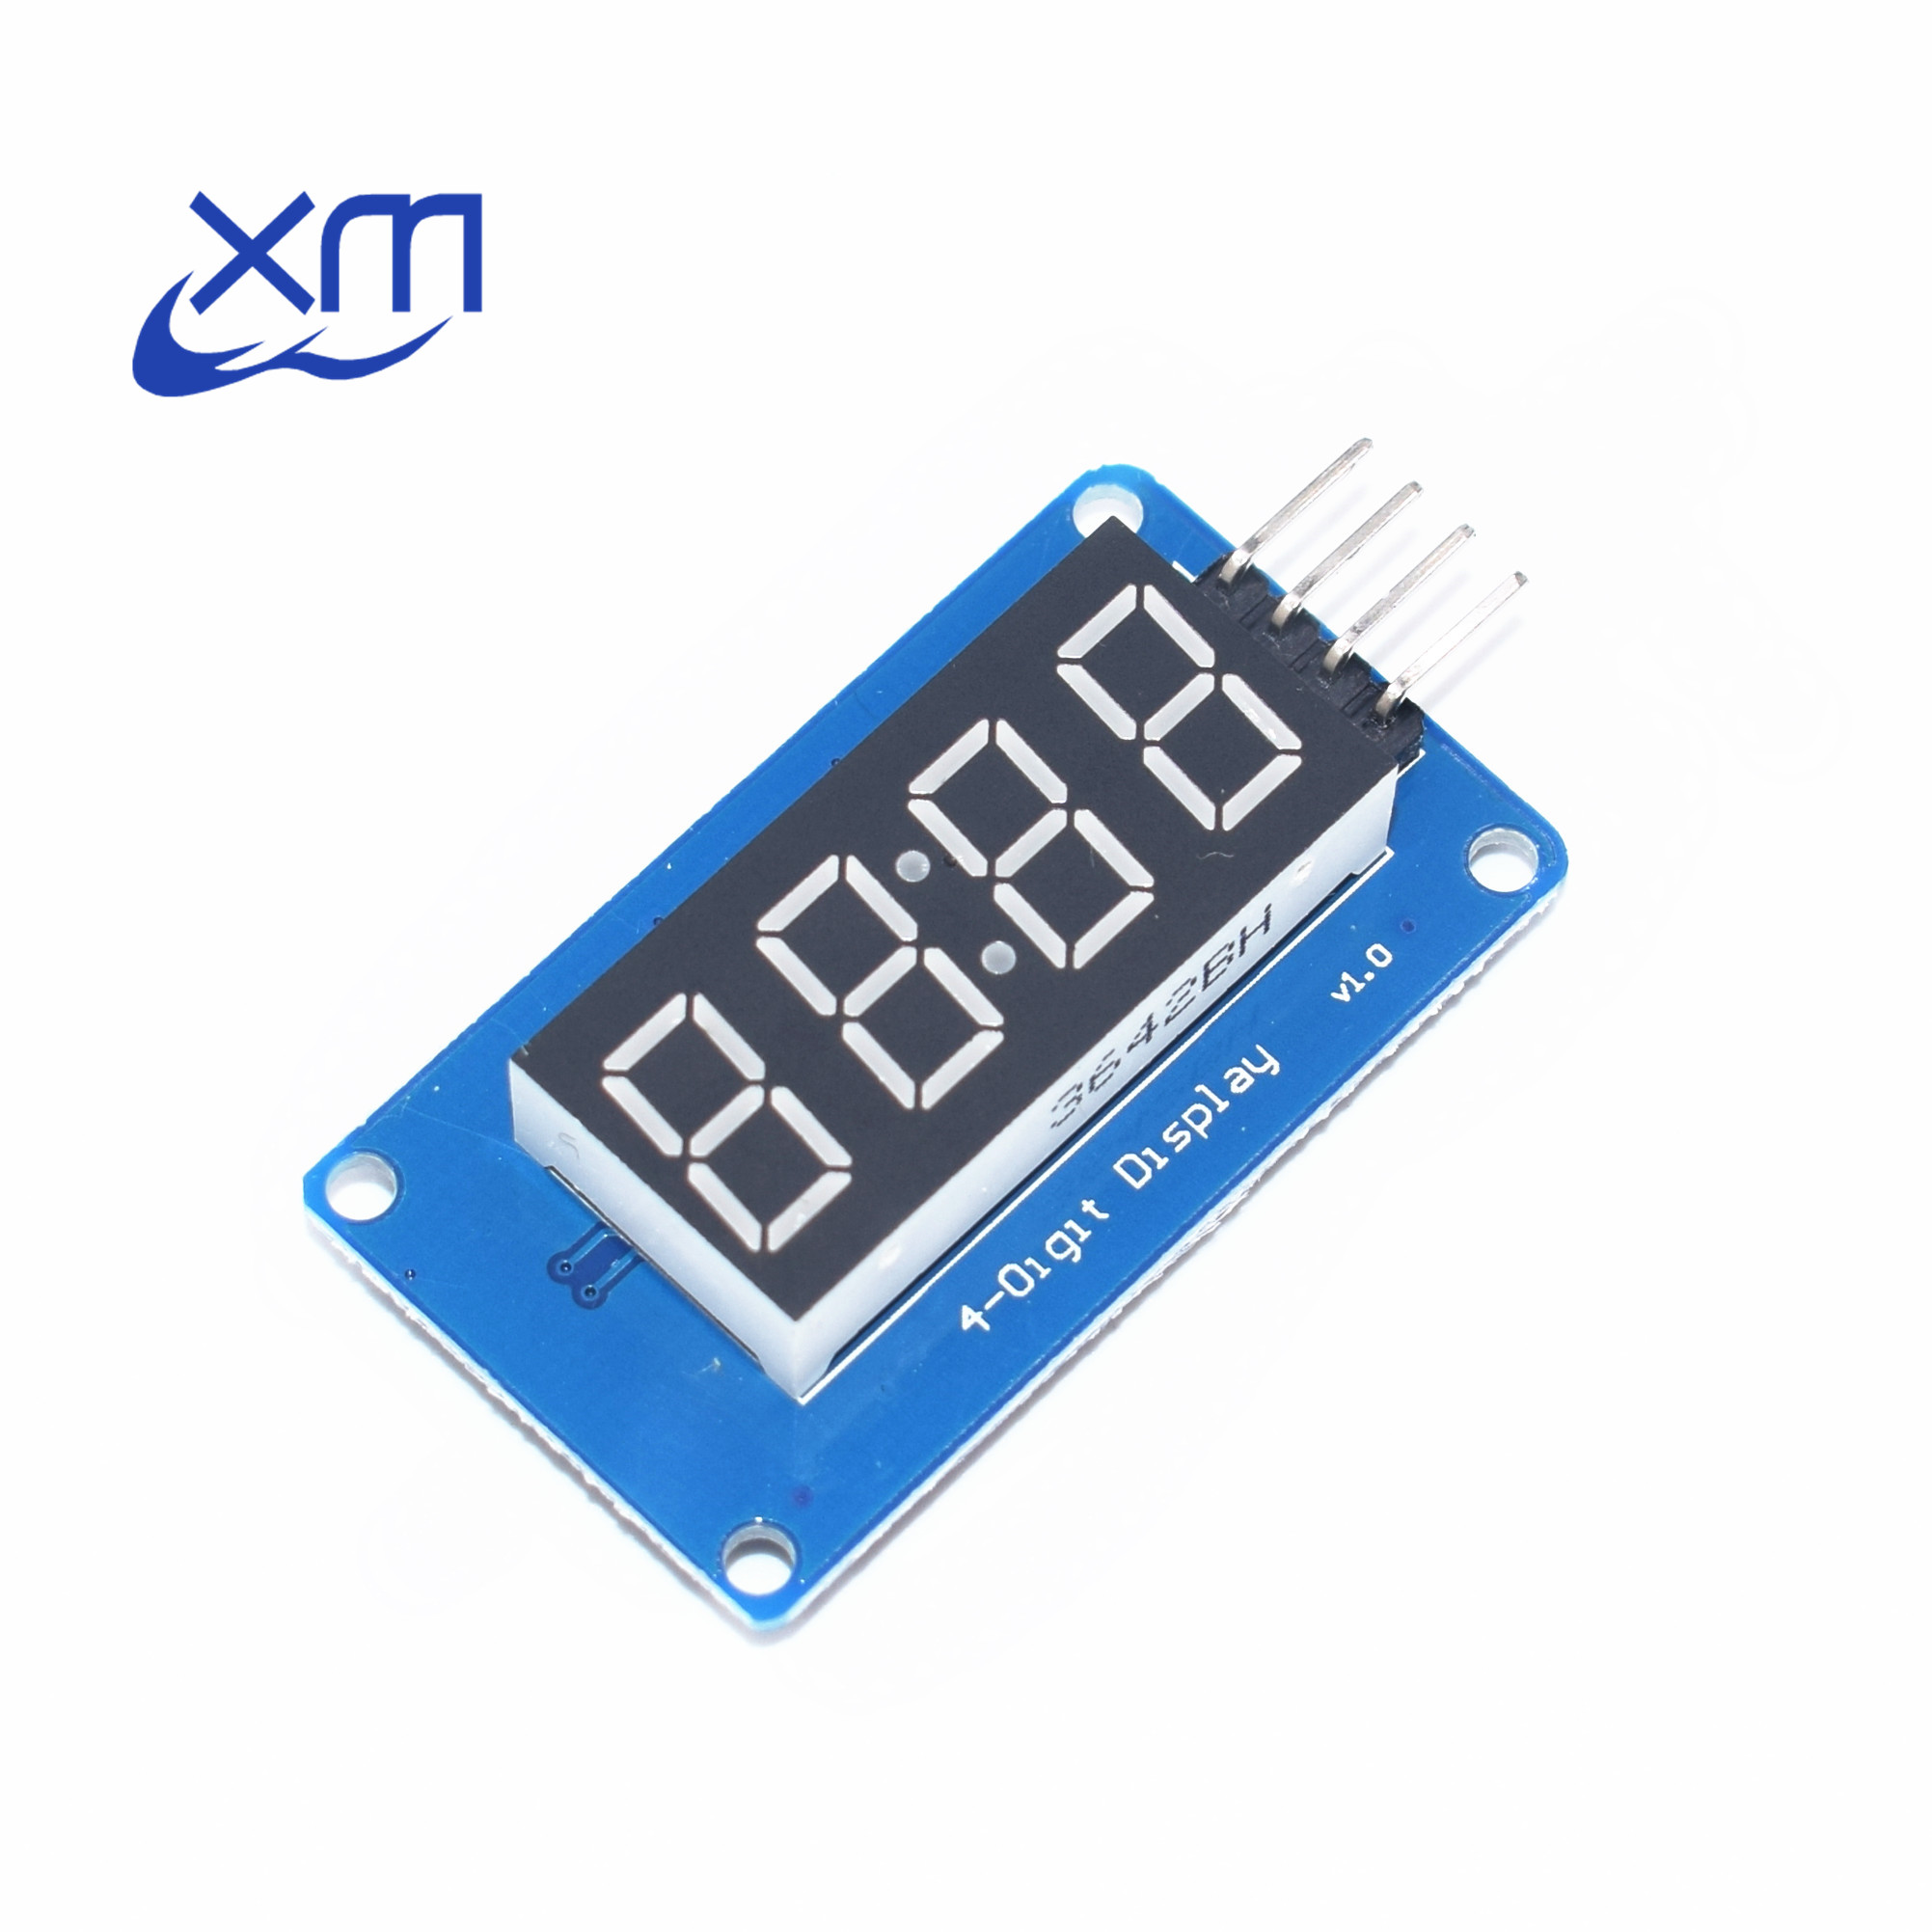 10pcs 4 Bits TM1637 Red Digital Tube LED Display Module & Clock  Free Shipping B51